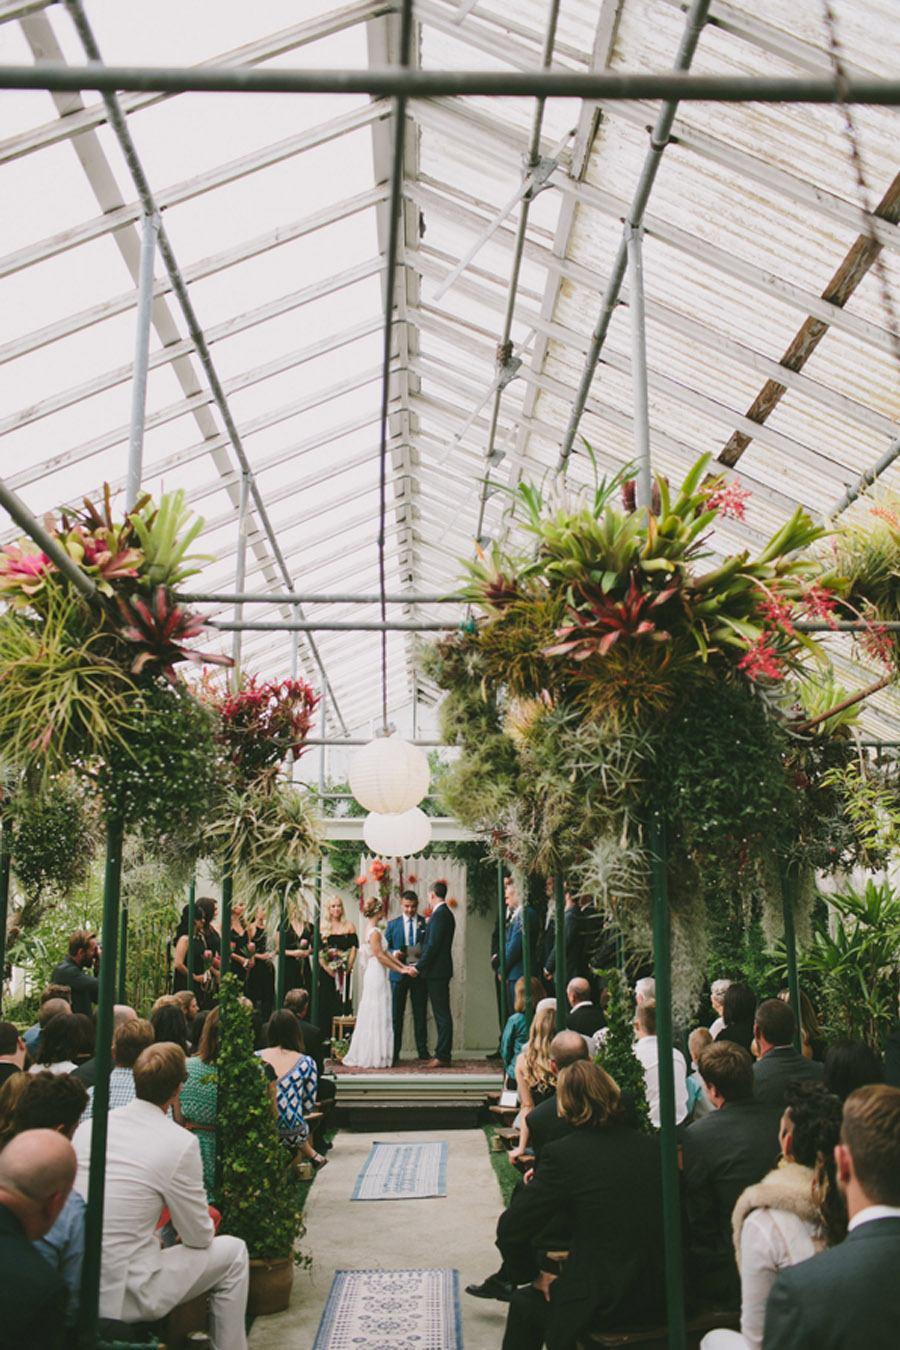 BODAS DE INVERNADERO invernaderos-para-bodas